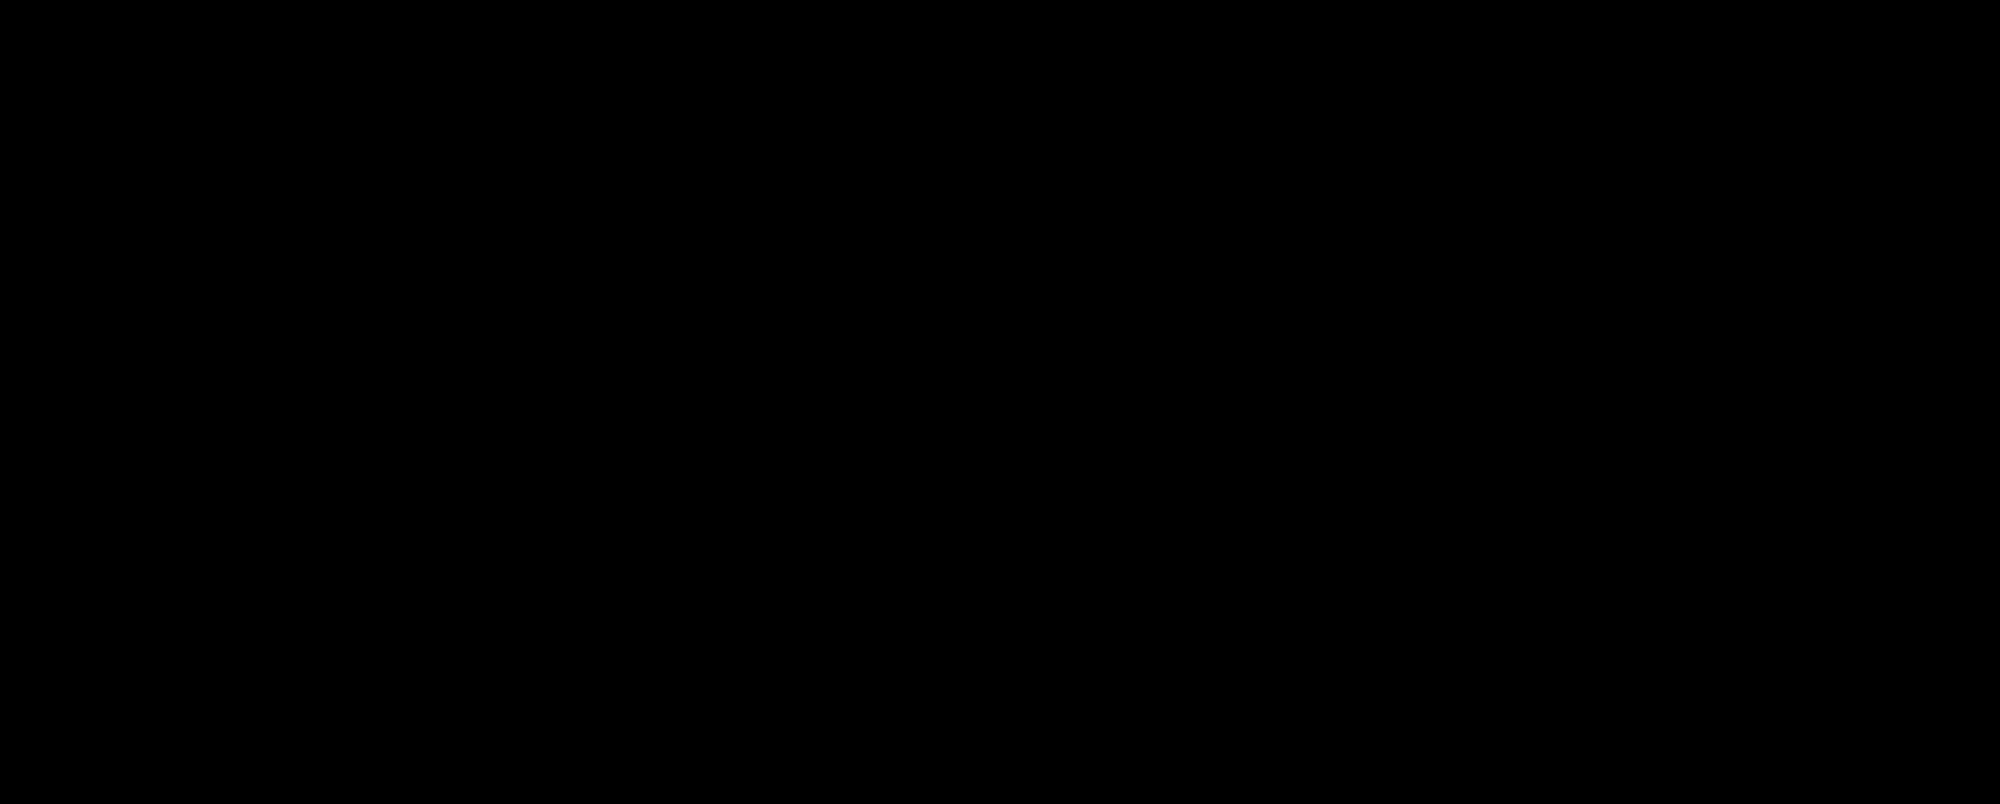 Cathyos Labs Pvt. Ltd. - Robotic Process Automation company logo